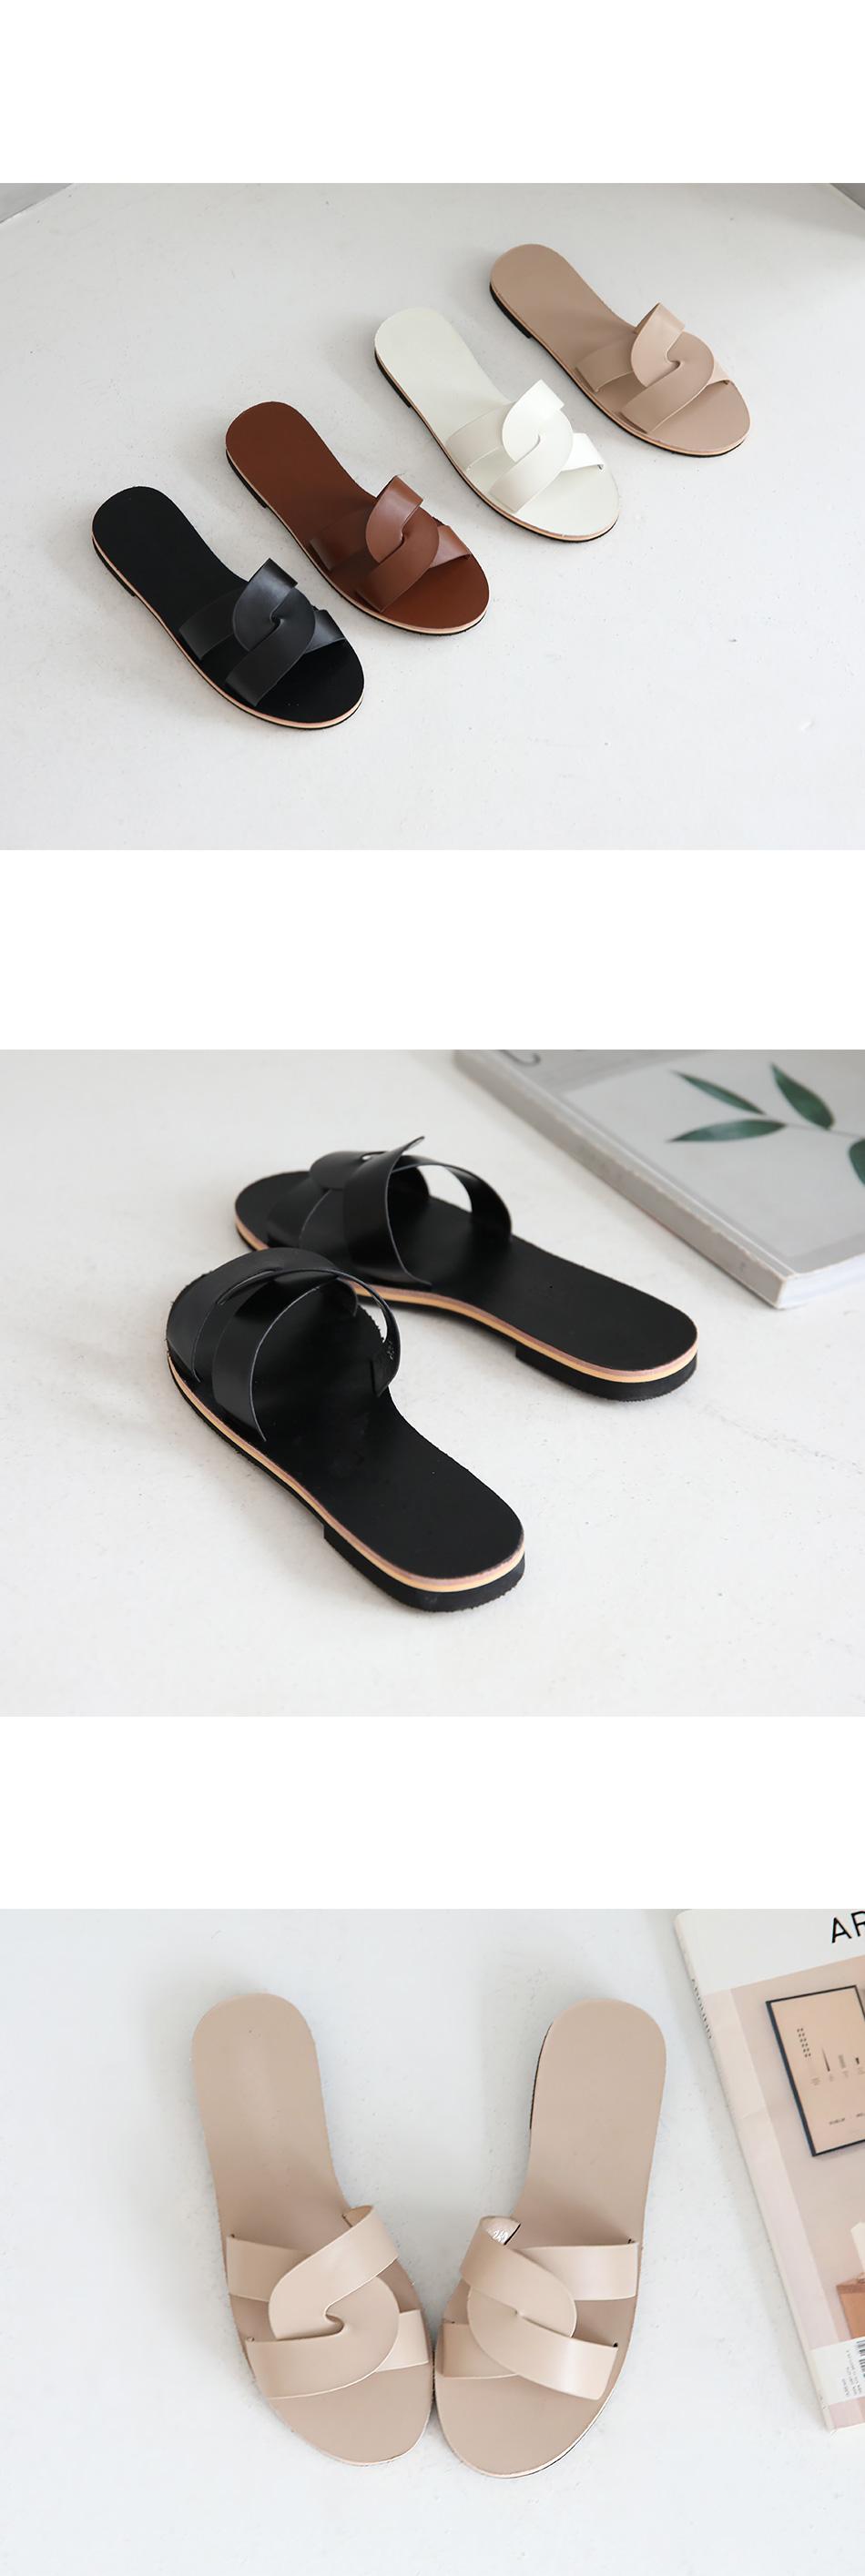 Ruble Run Slippers 1cm